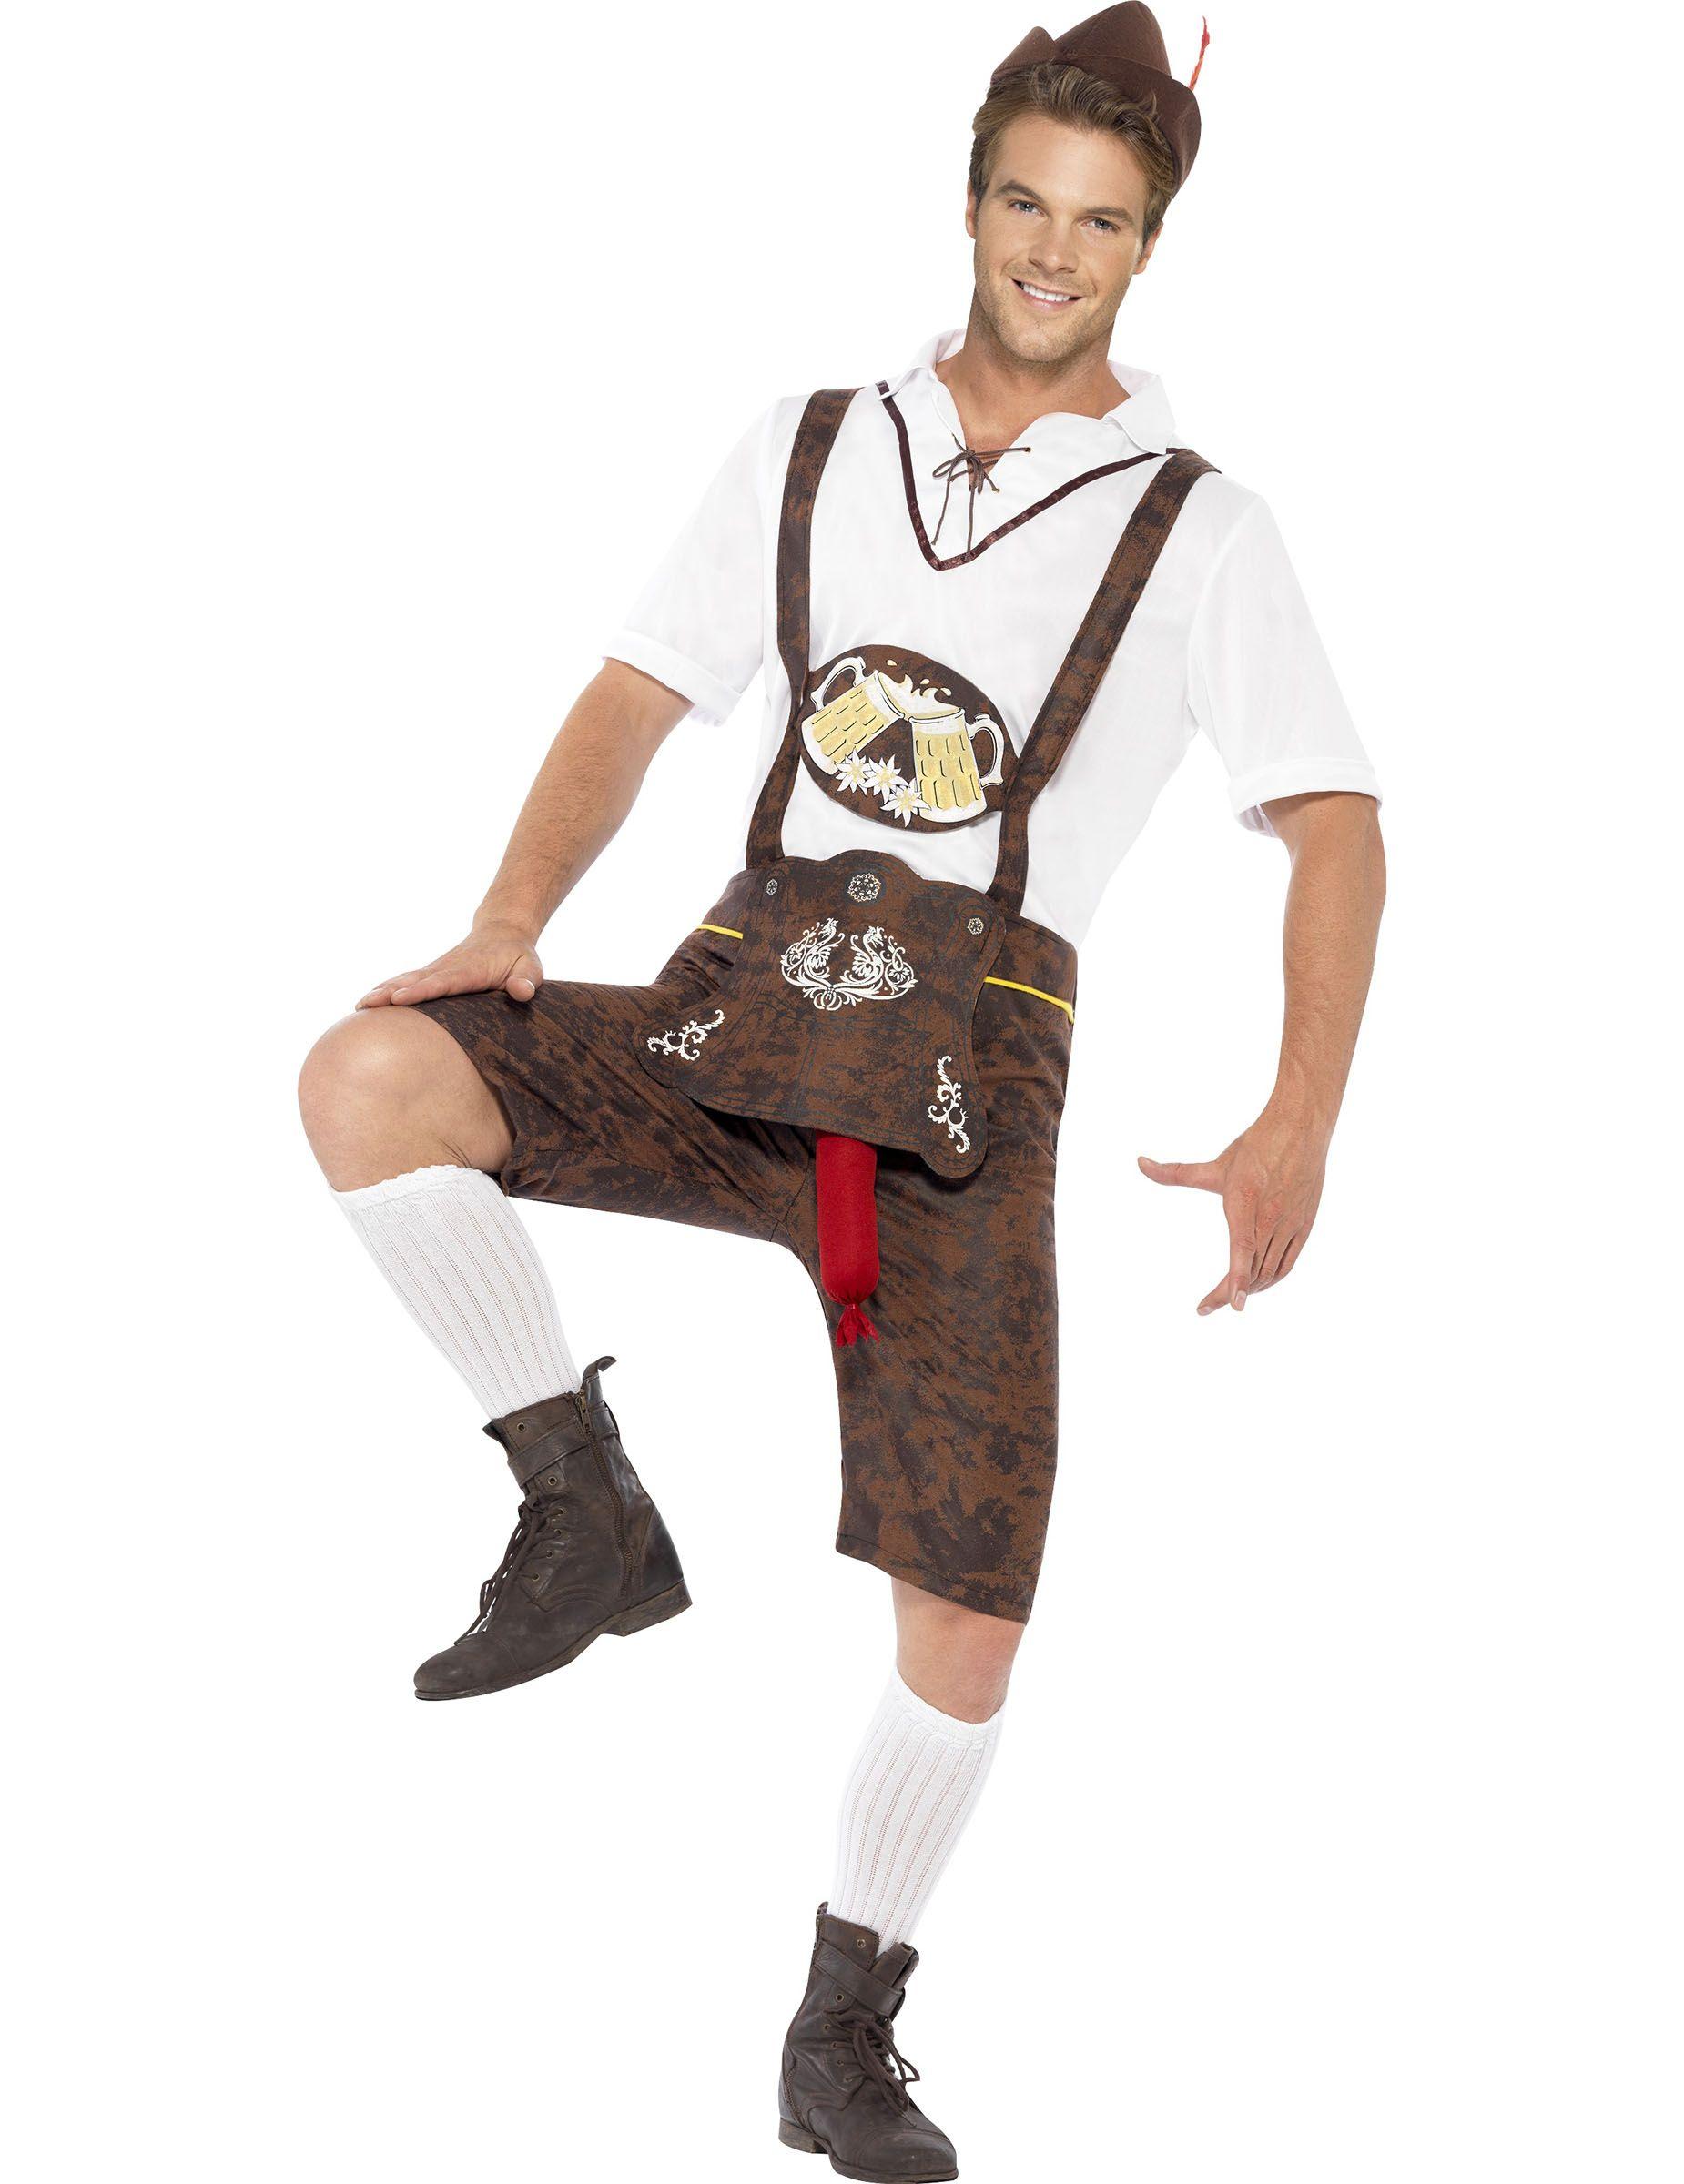 bayerische tracht als lustiges kost m f r m nner costumes. Black Bedroom Furniture Sets. Home Design Ideas